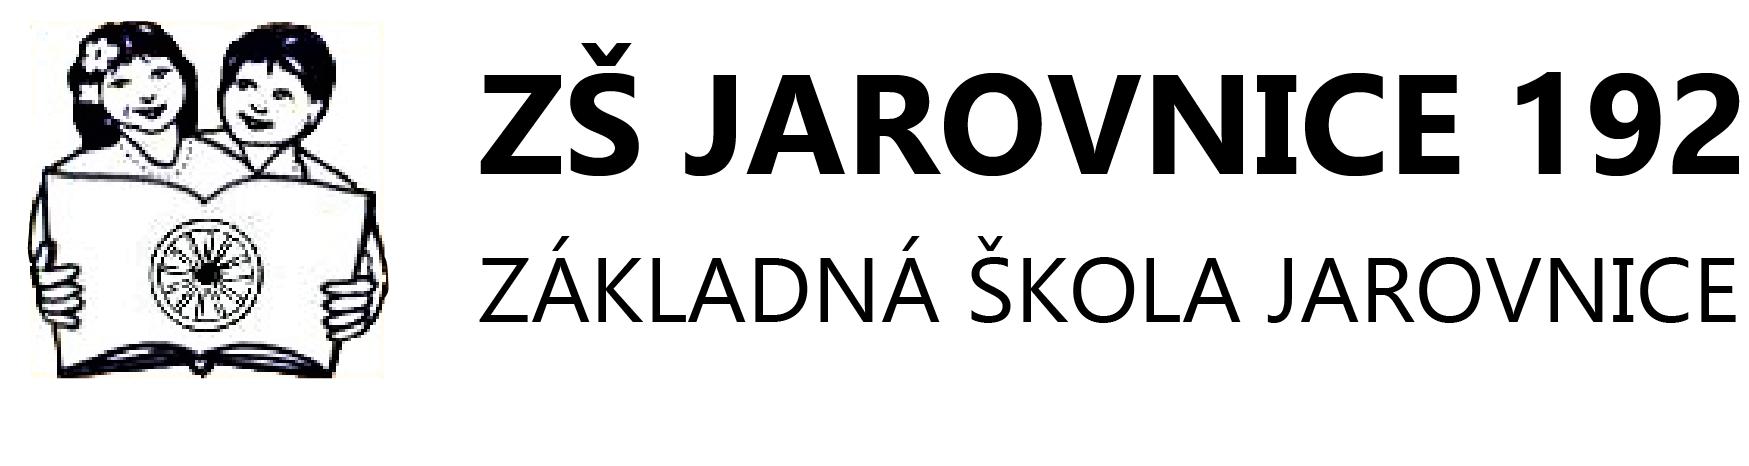 ZŠ Jarovnice